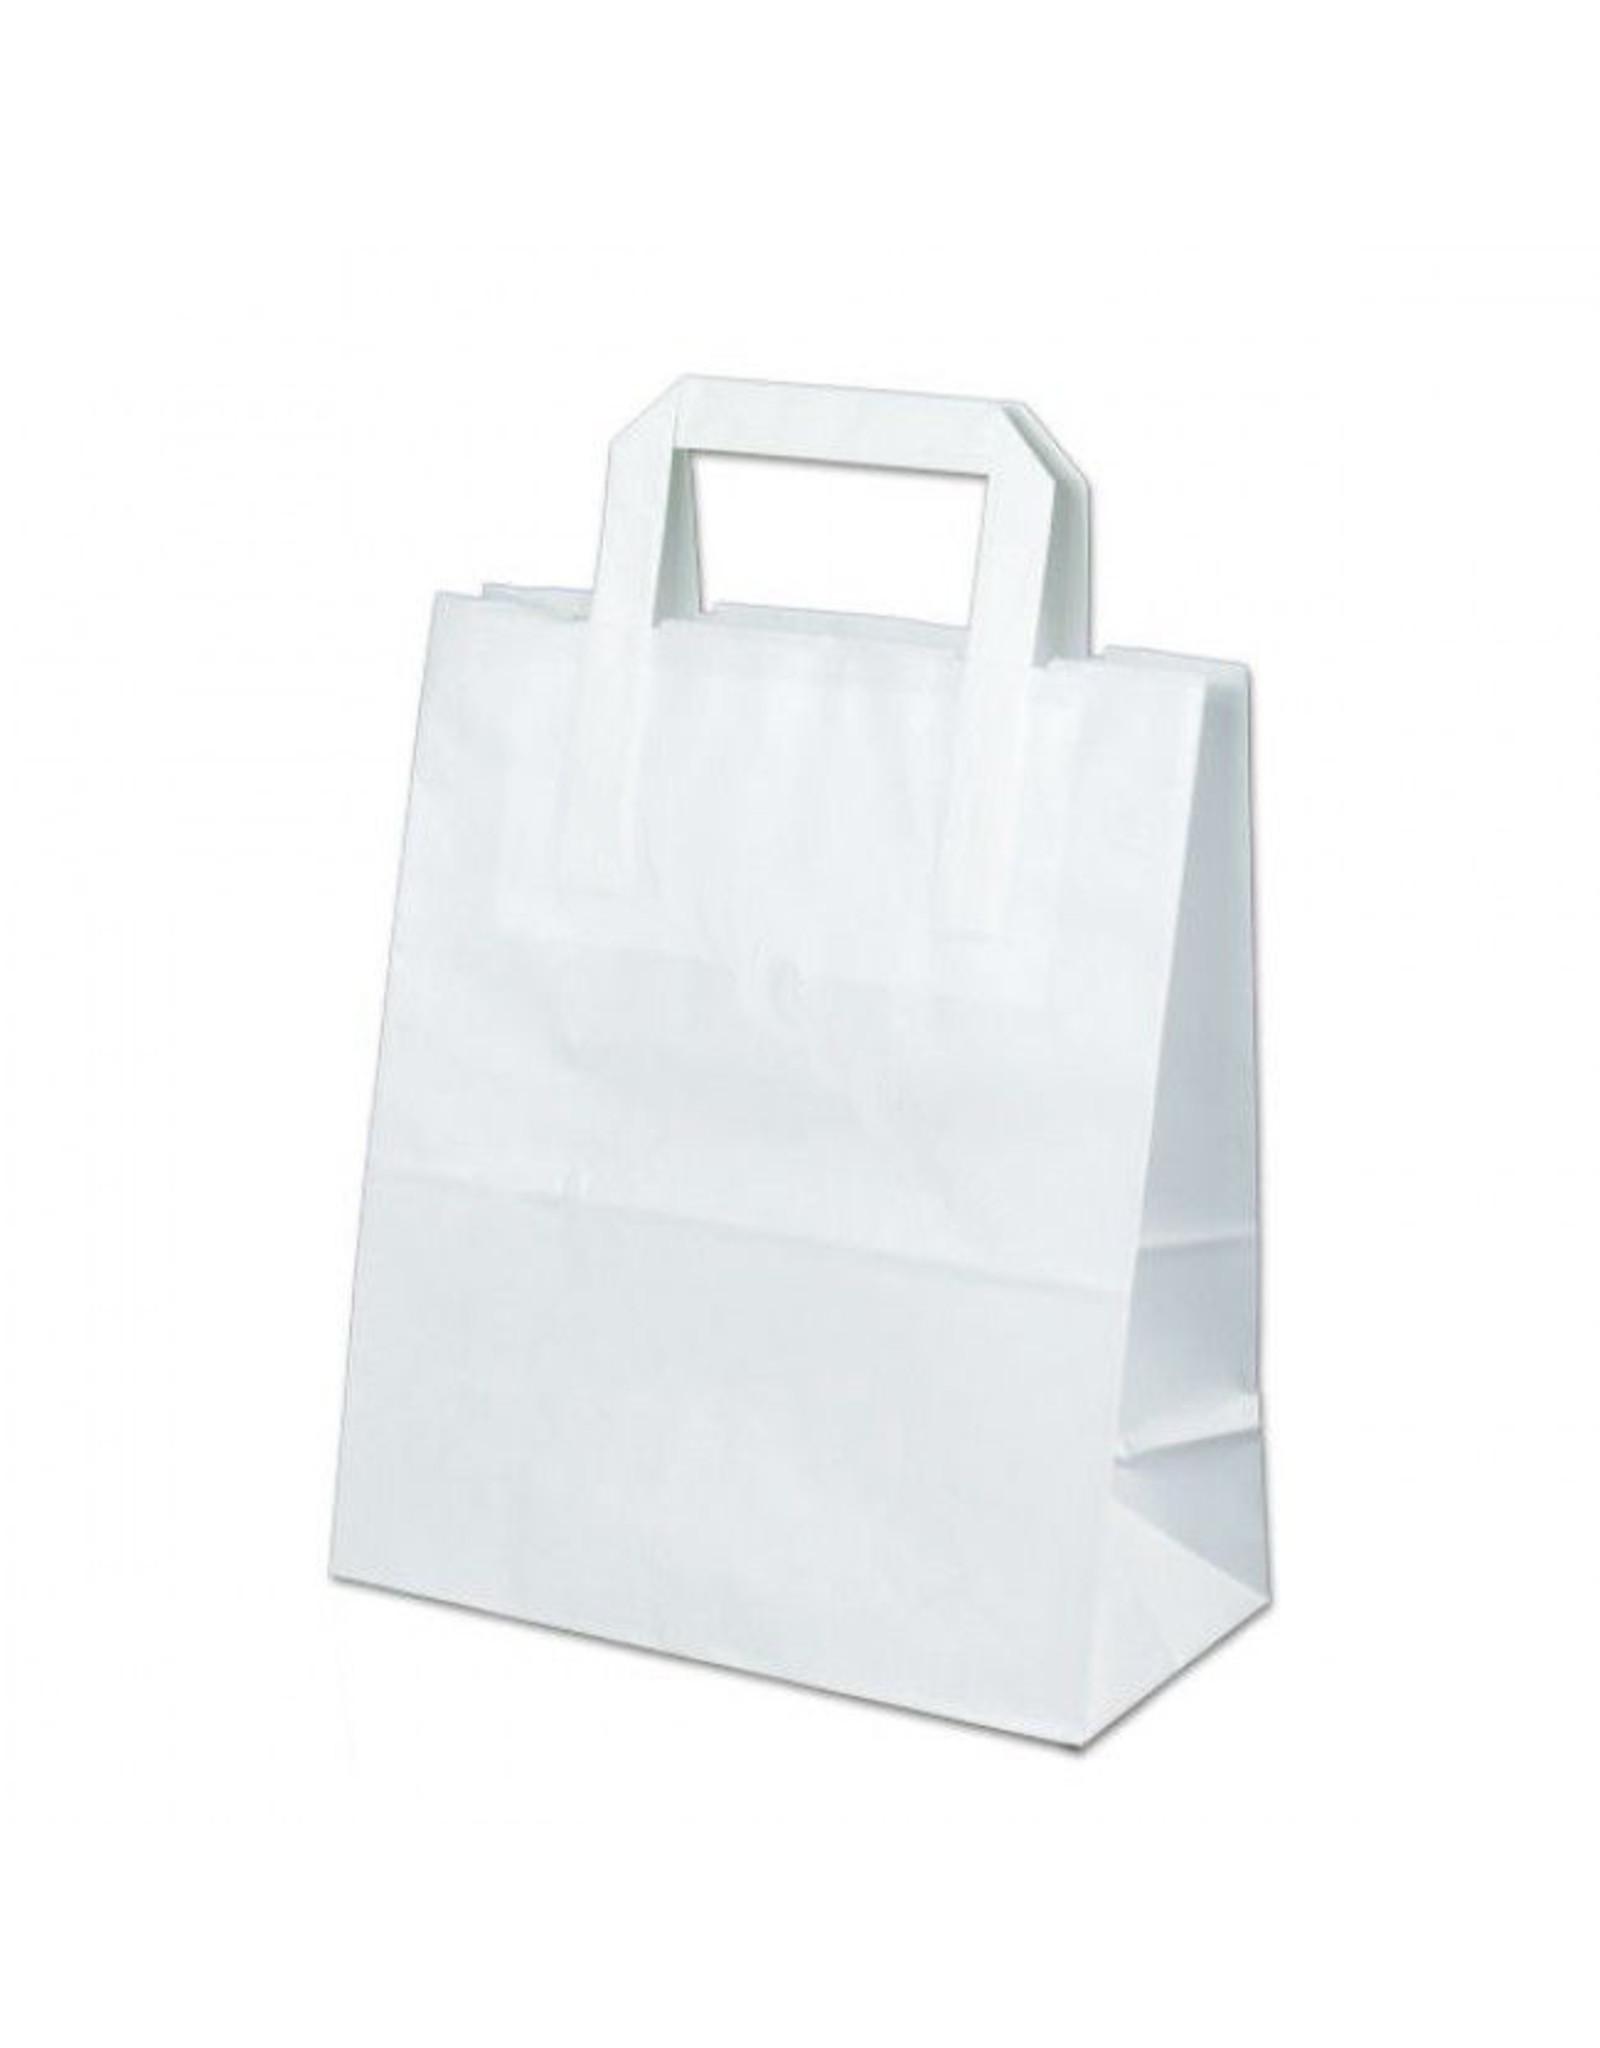 White 2 cupcake paper carrier bag (100 pcs.)